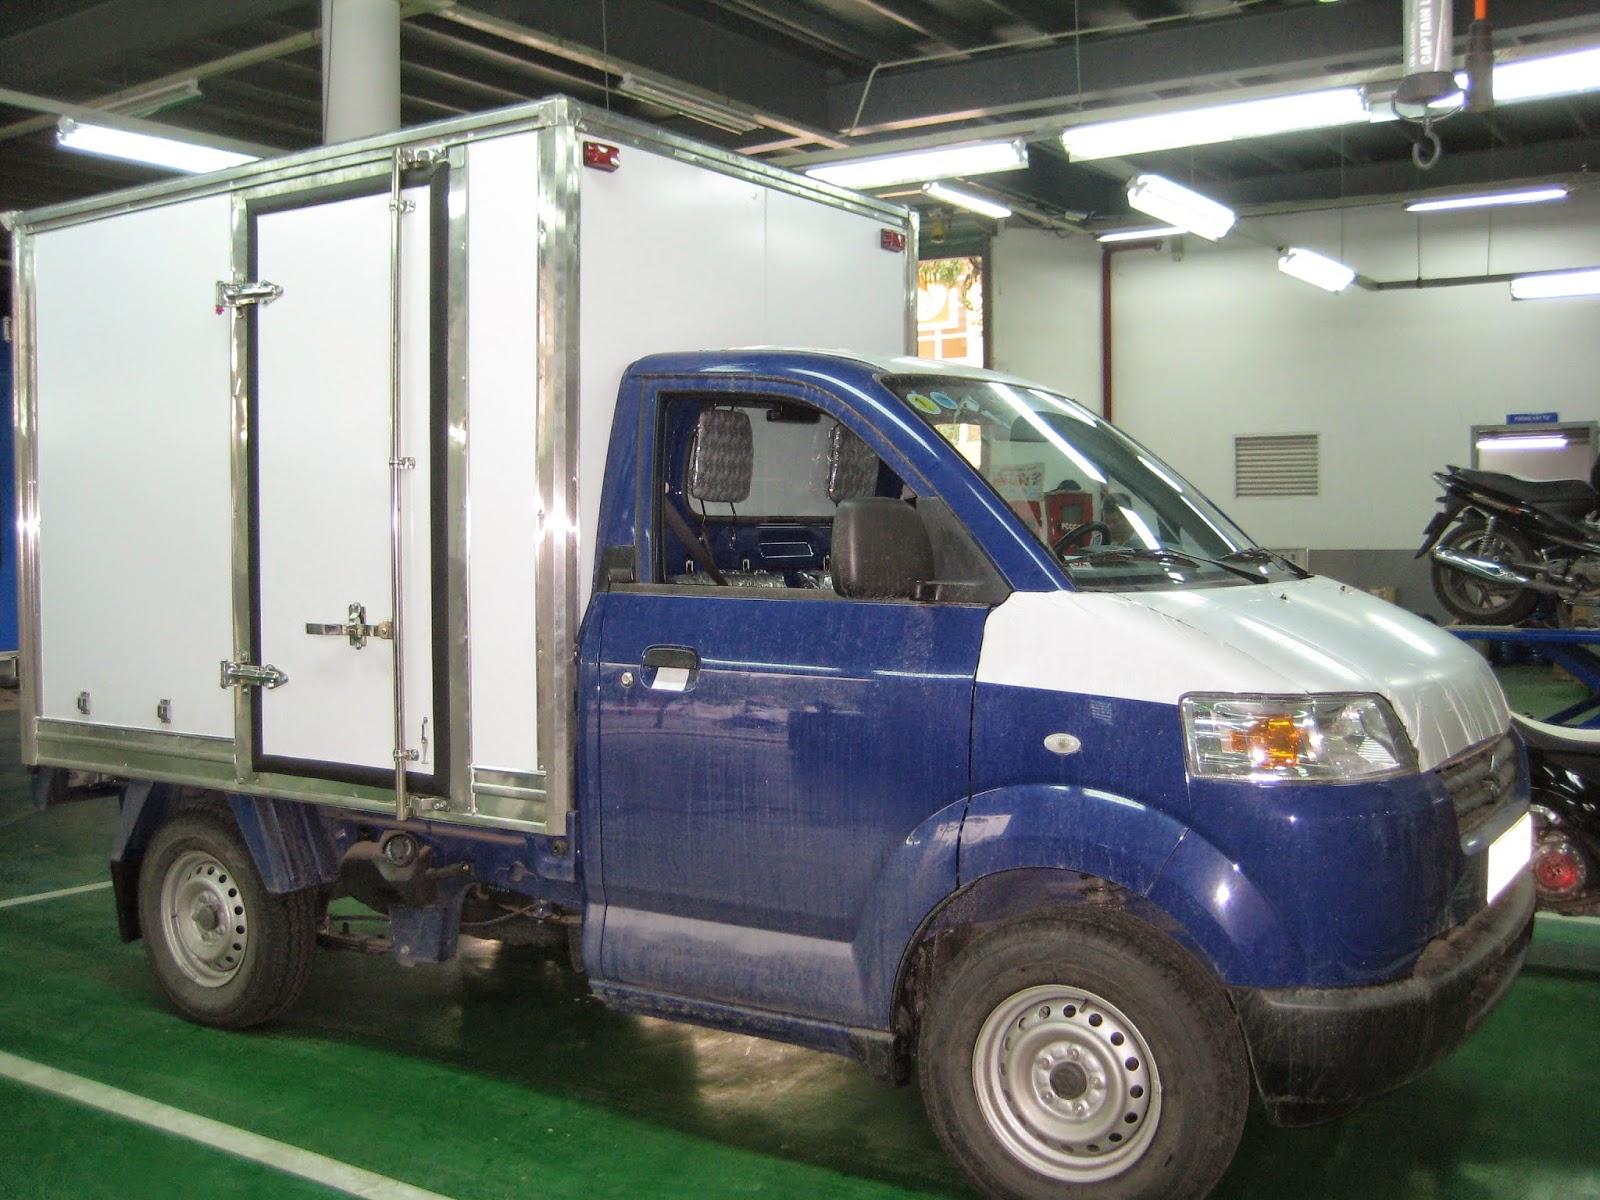 mua xe tải Suzuki ở đâu ảnh số 3